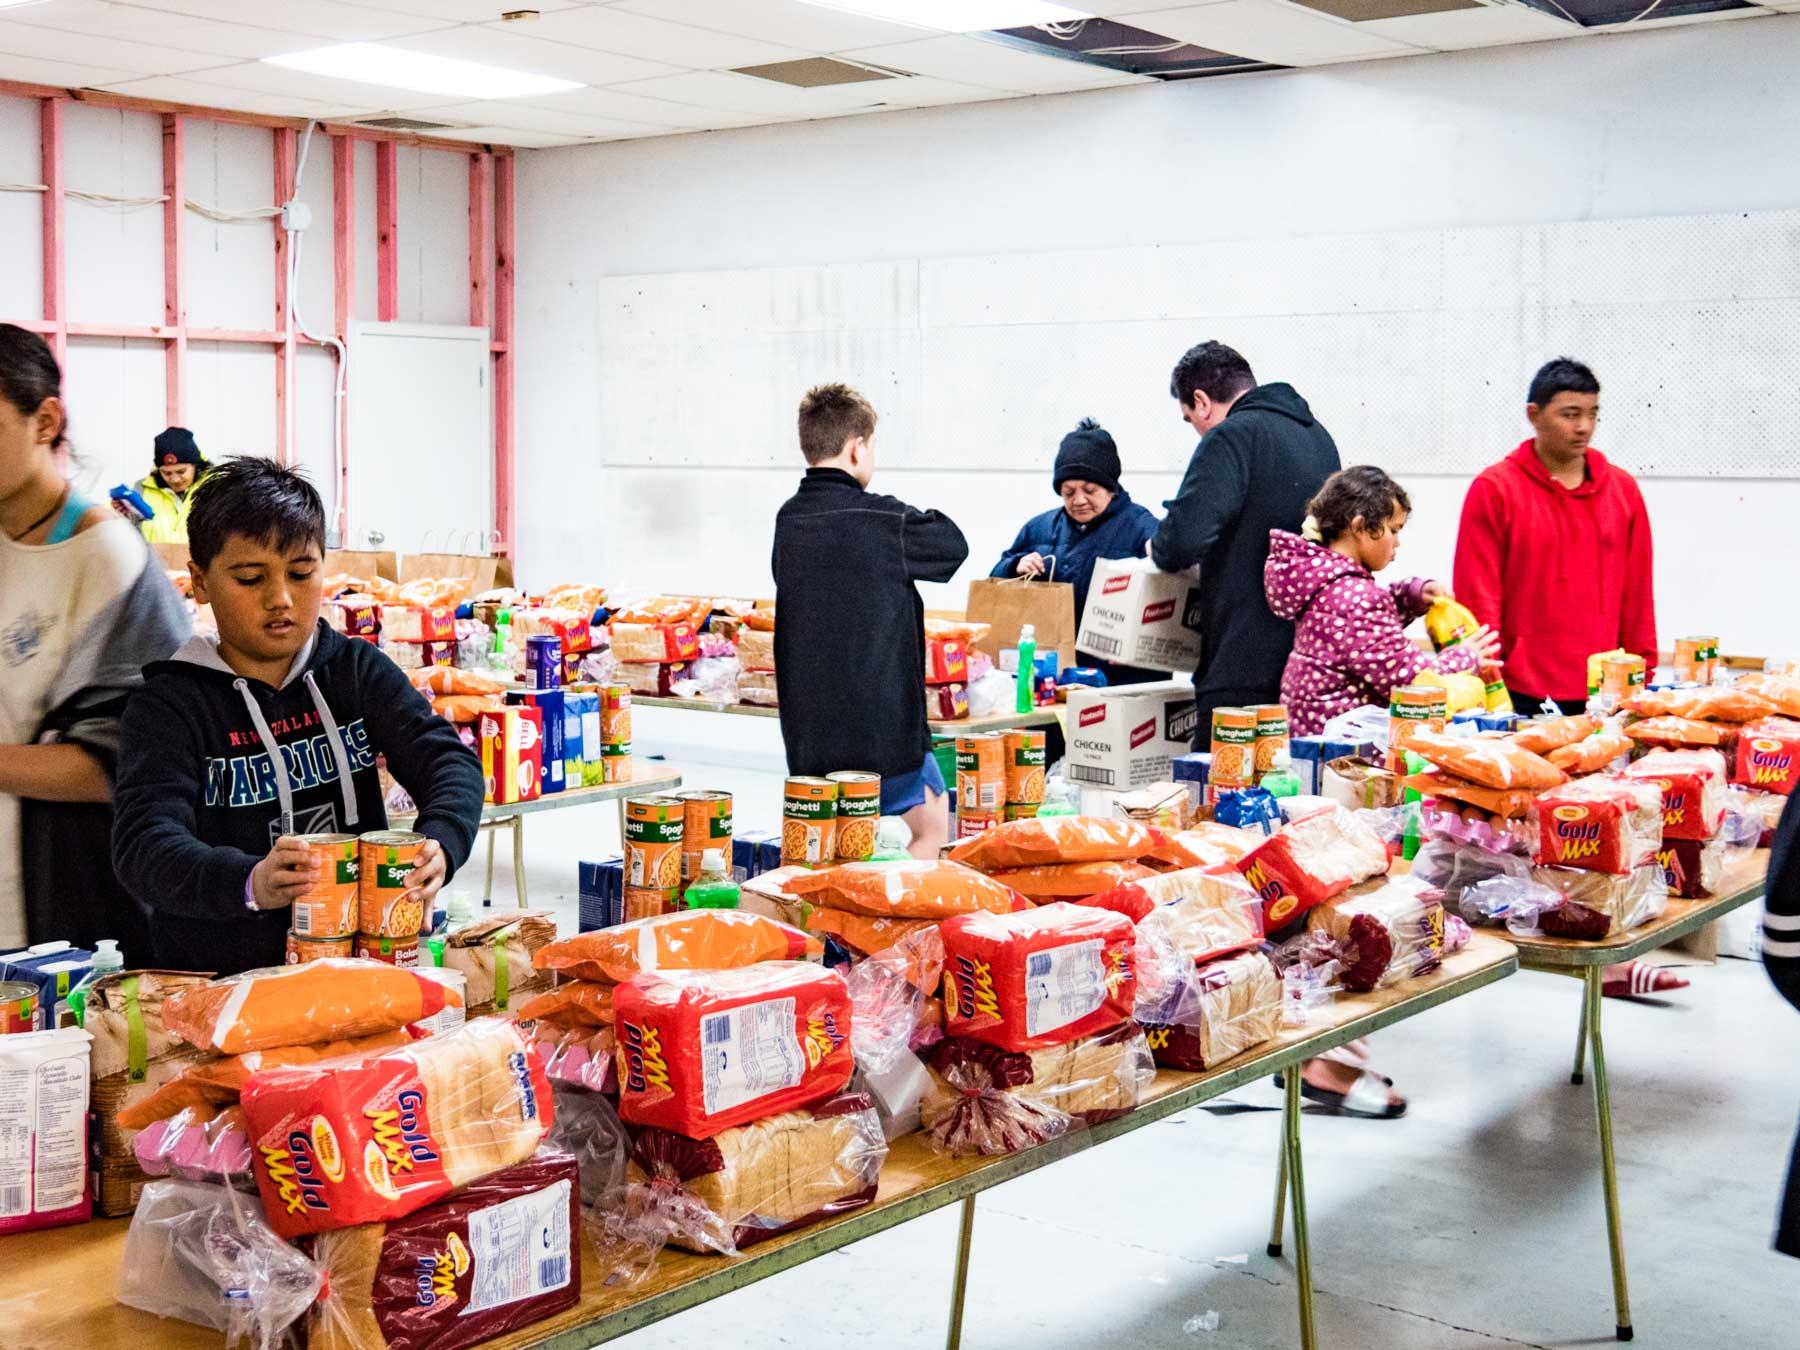 Children help prepare food parcels